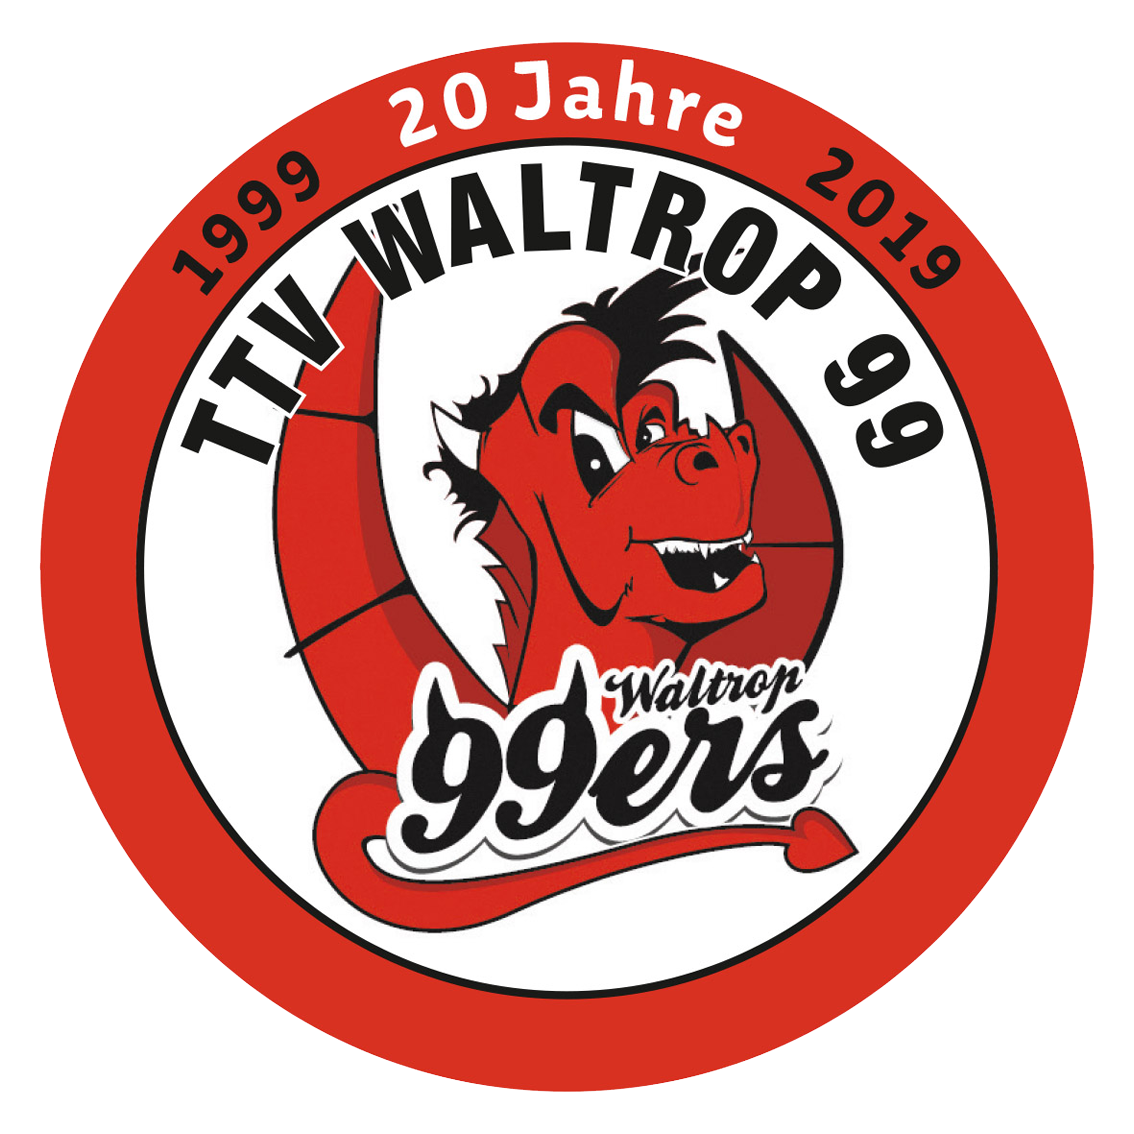 TTV Waltrop 99